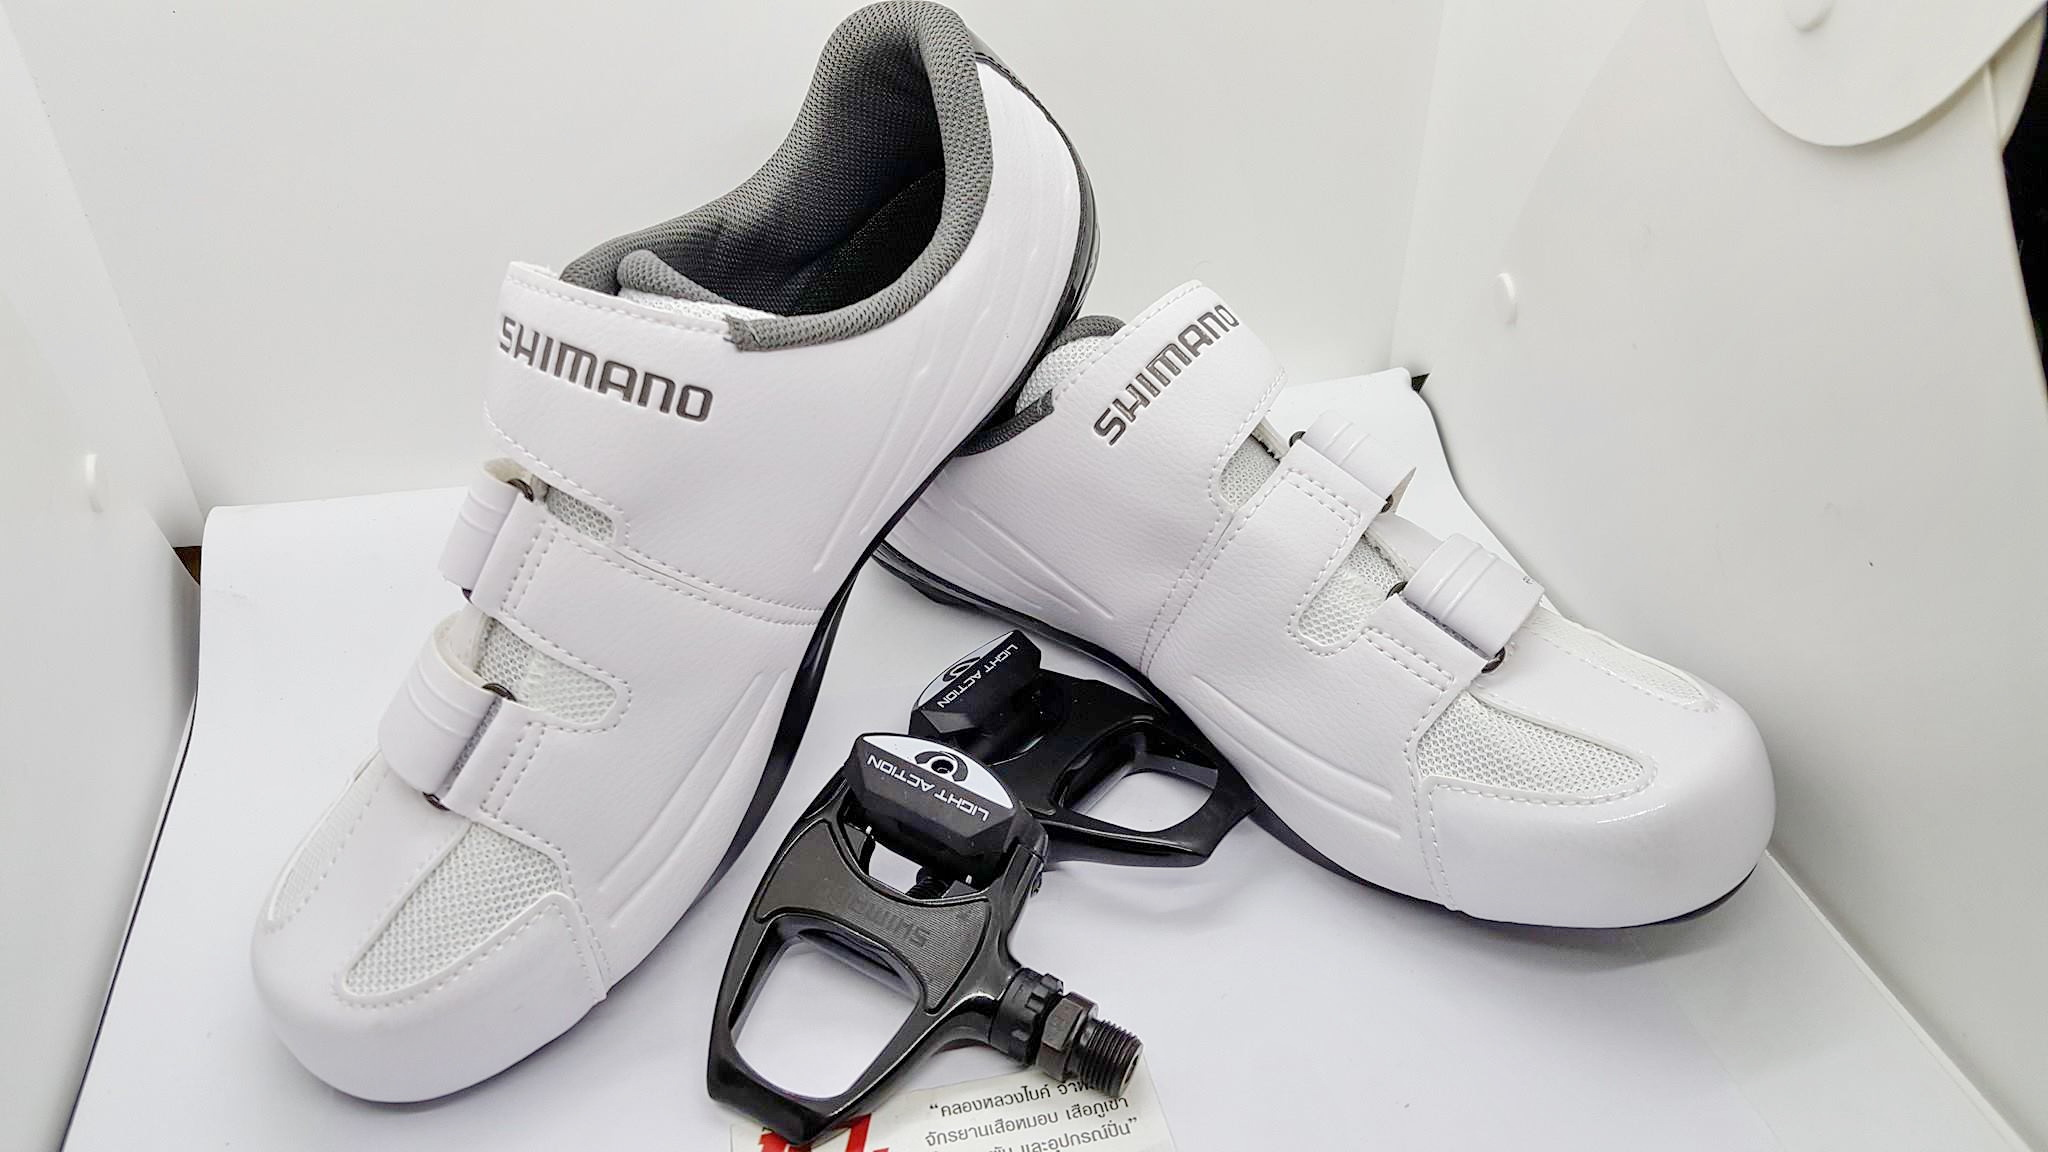 Combo Shimano Set รองเท้ารุ่น RP3 White รับทันที บันไดคลีตรุ่น R540 Light Action